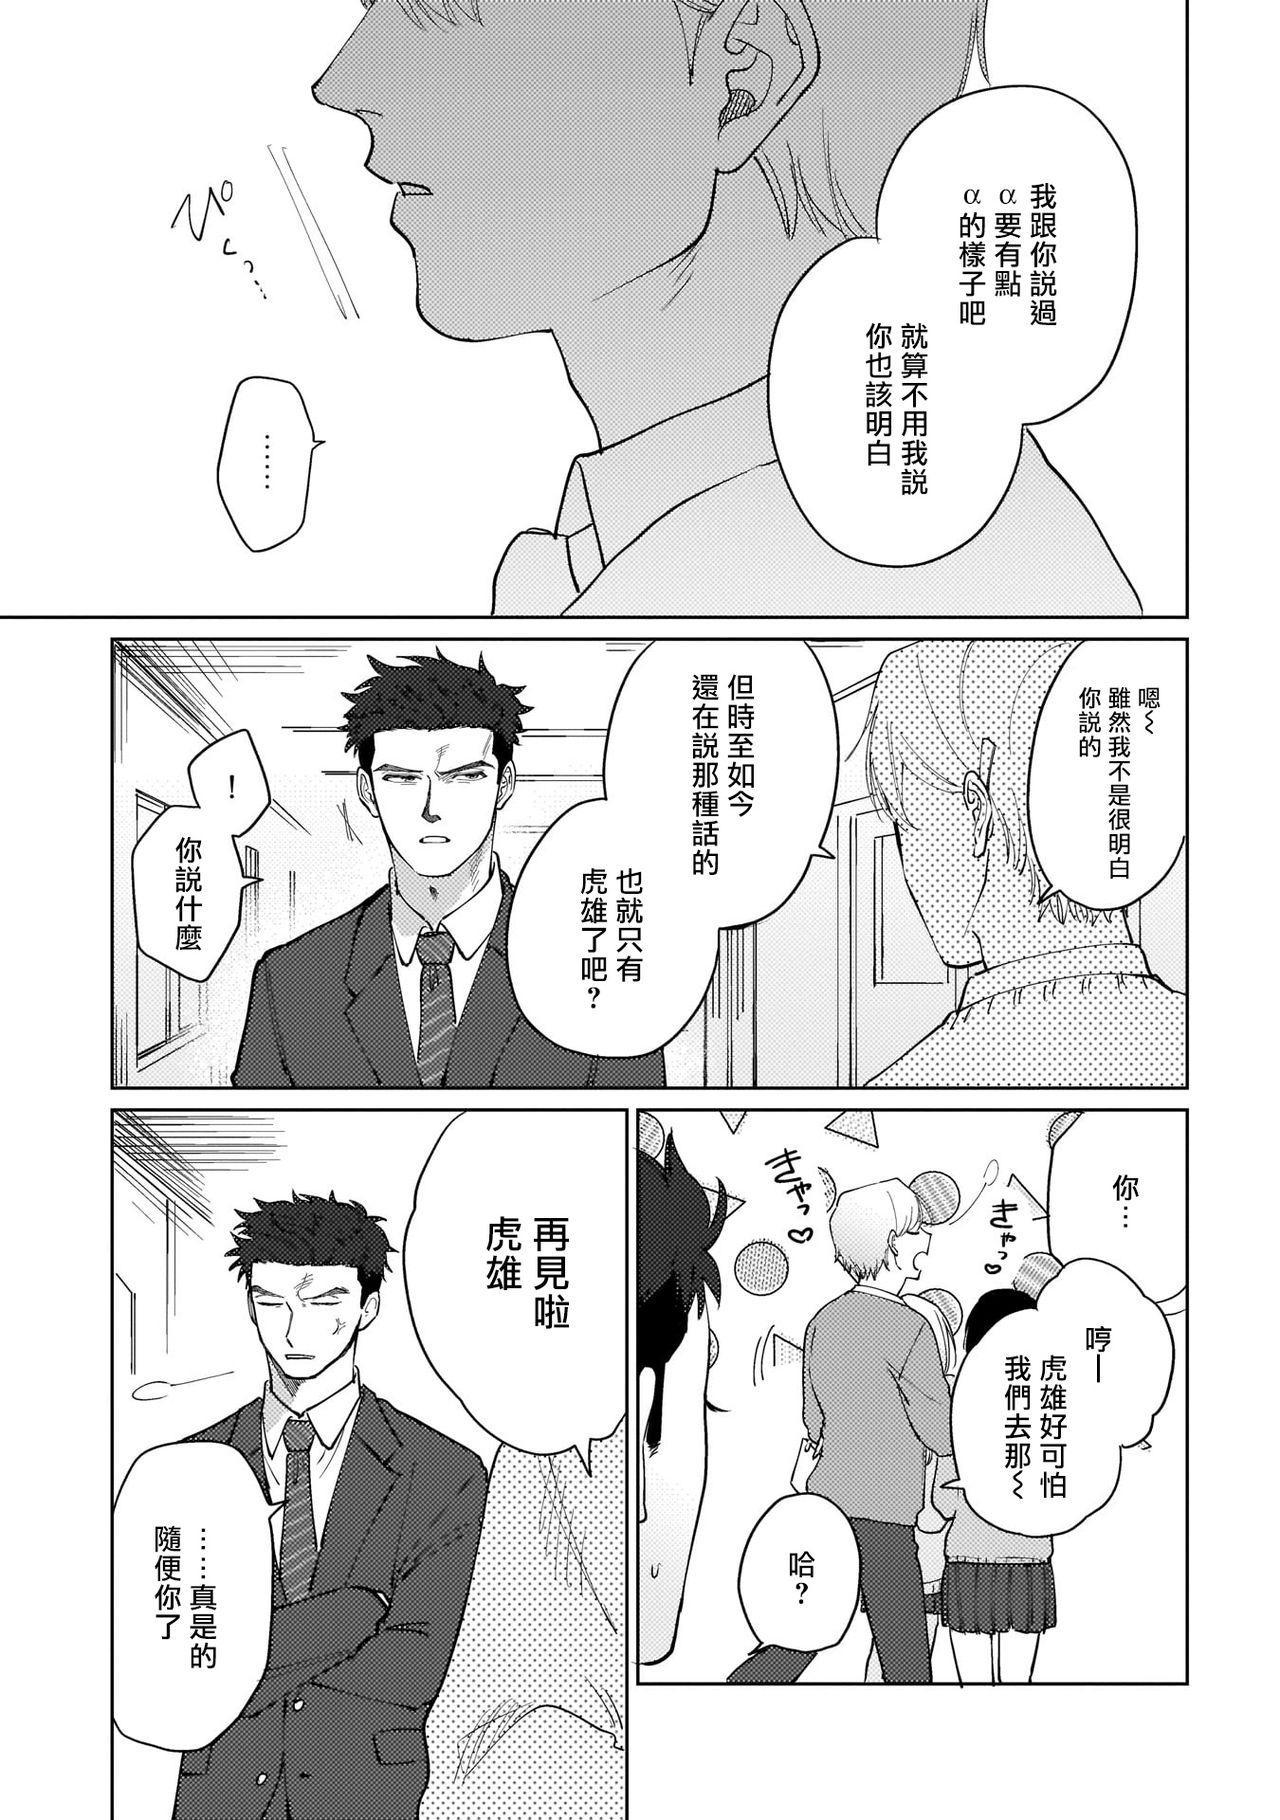 Bokura wa Unmei Janai | 我们不是命定之番 1-3 8